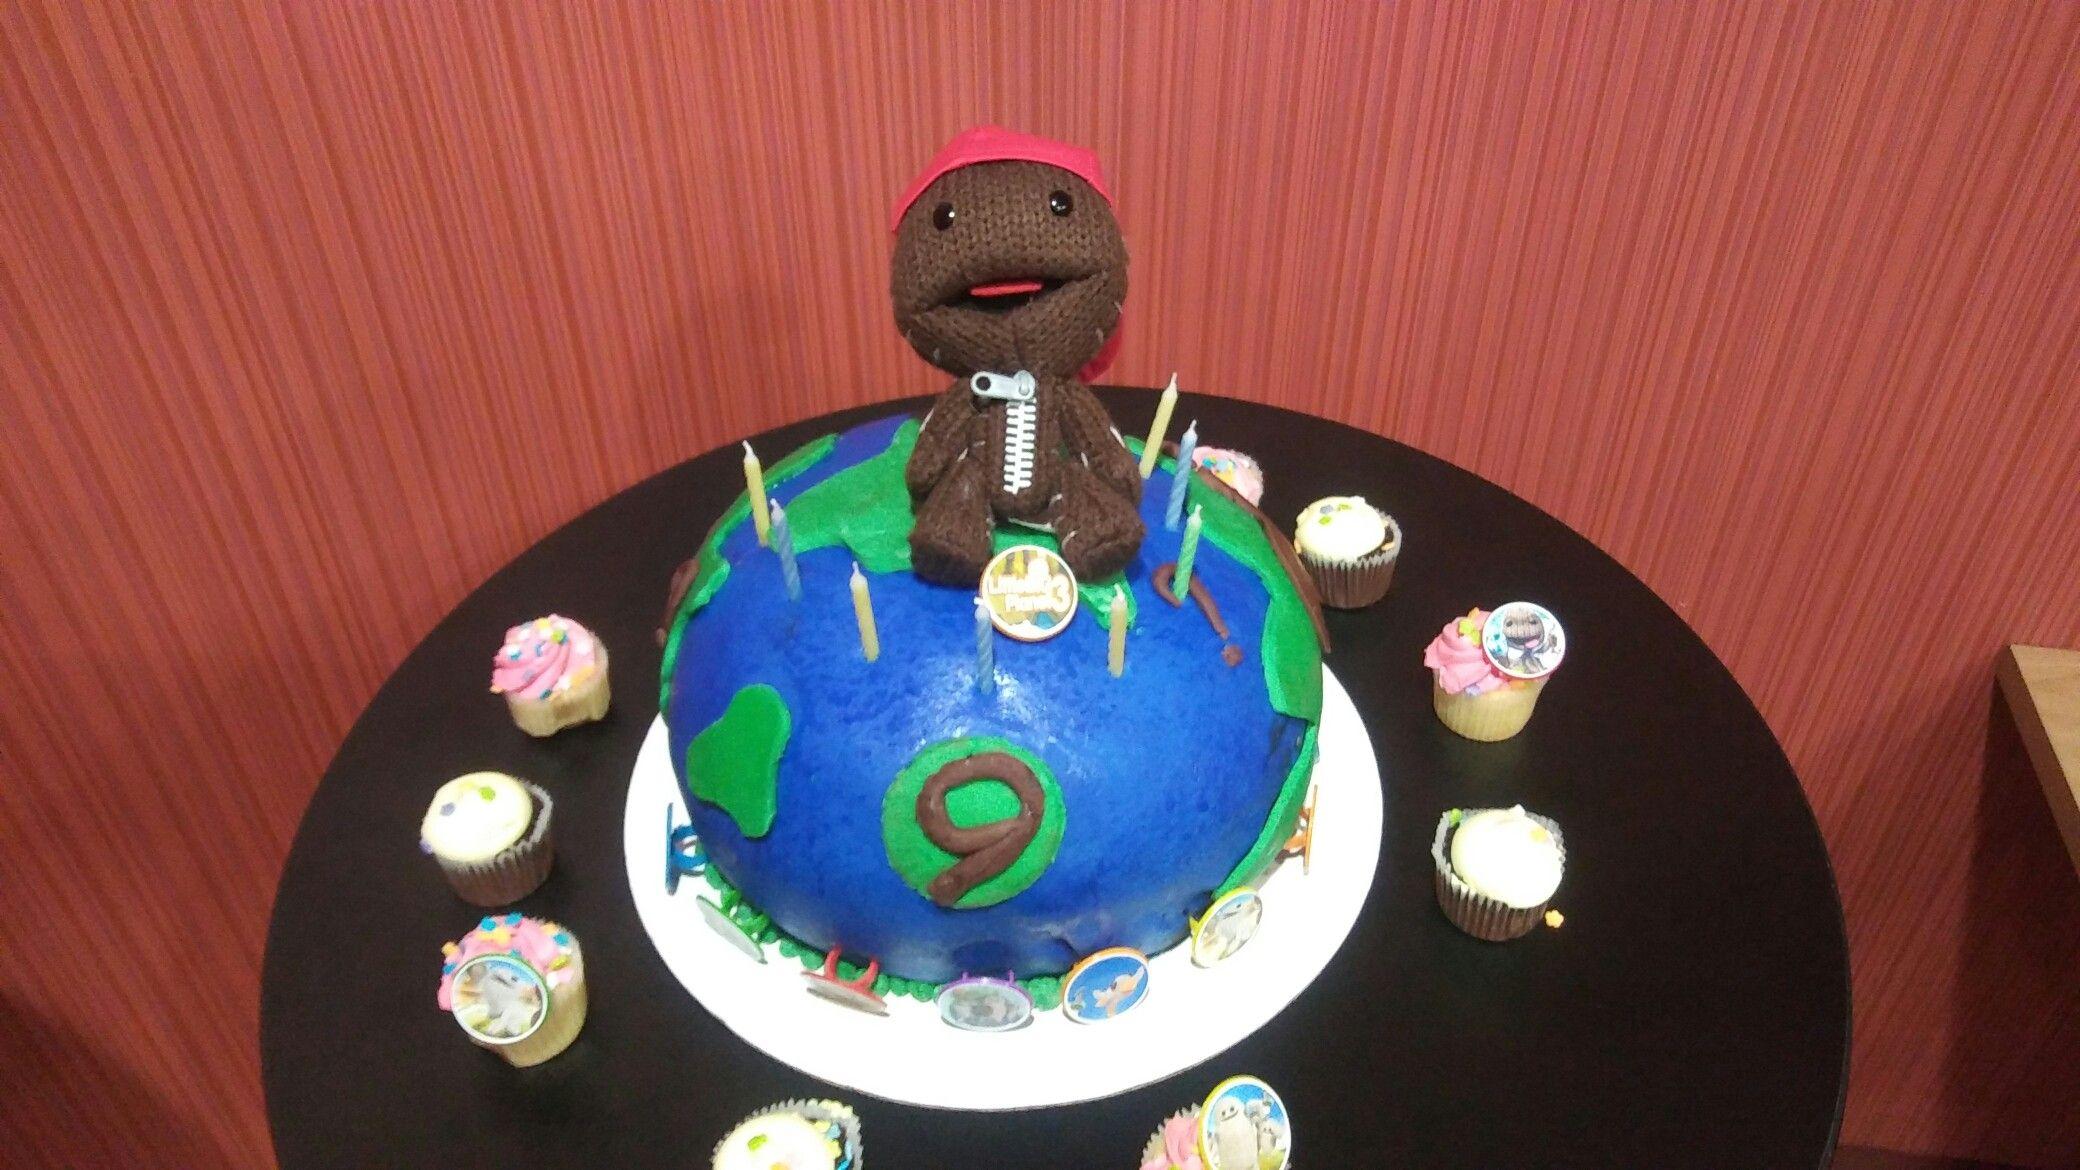 Peachy Little Big Planet Birthday Cake For 9 Year Old Planet Birthday Birthday Cards Printable Riciscafe Filternl